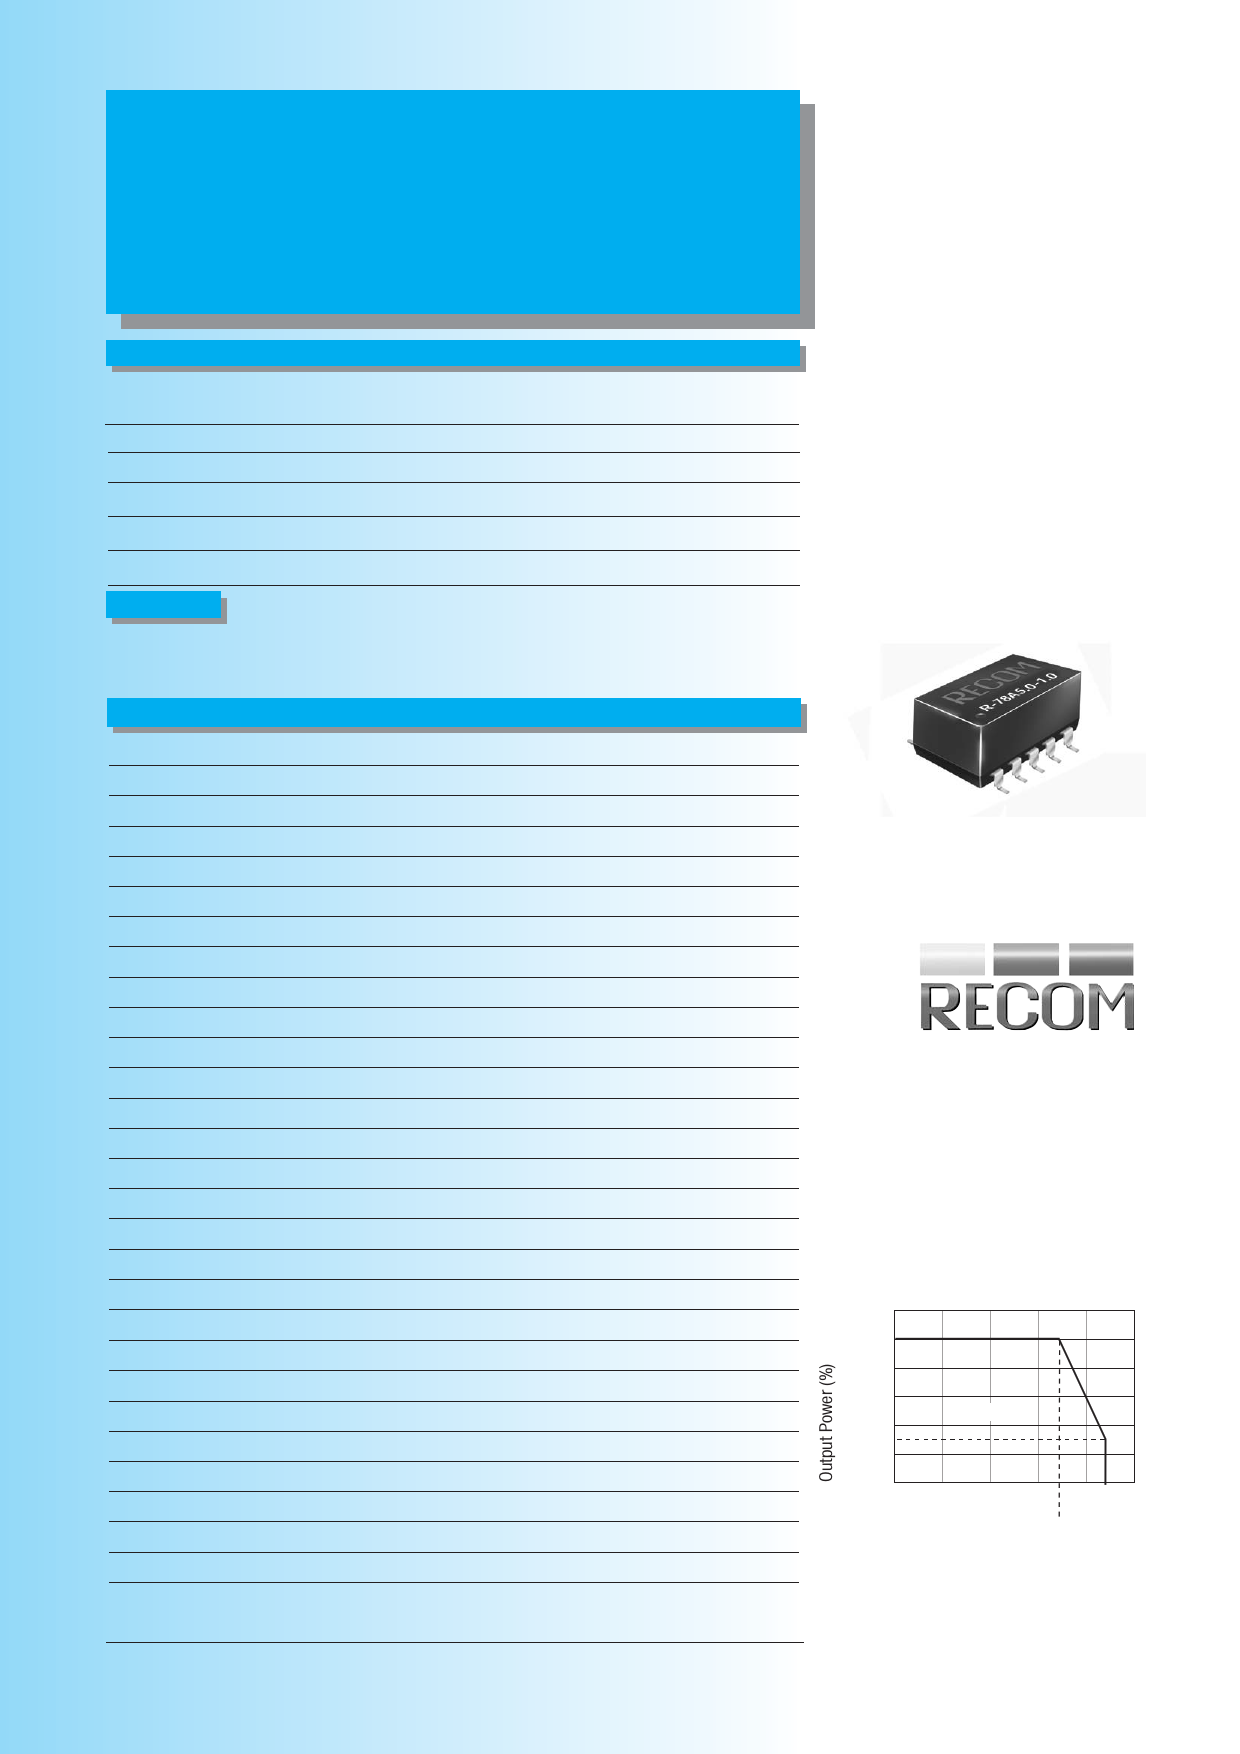 R-78Axx-1.0SMD даташит PDF